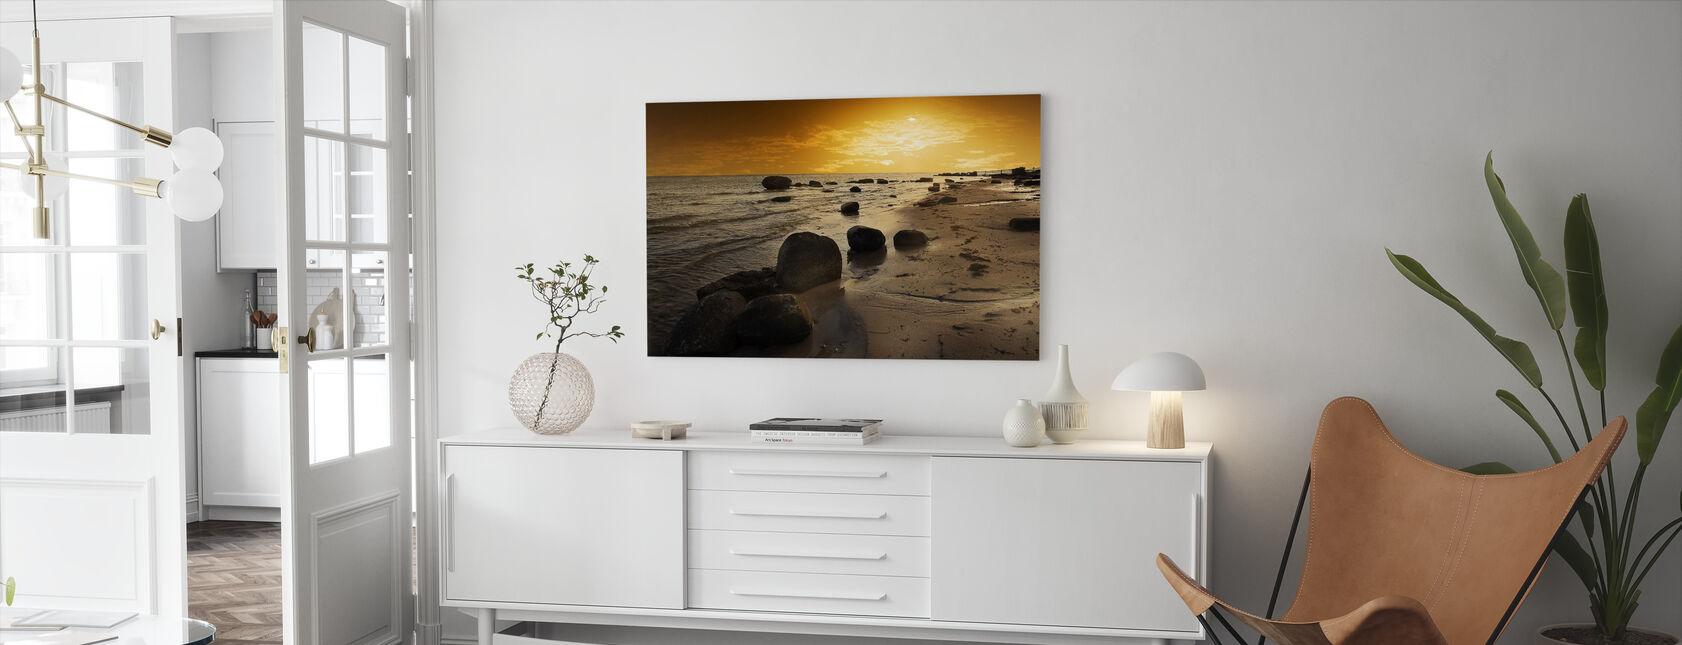 Golden Beach Sunset - Canvastaulu - Olohuone